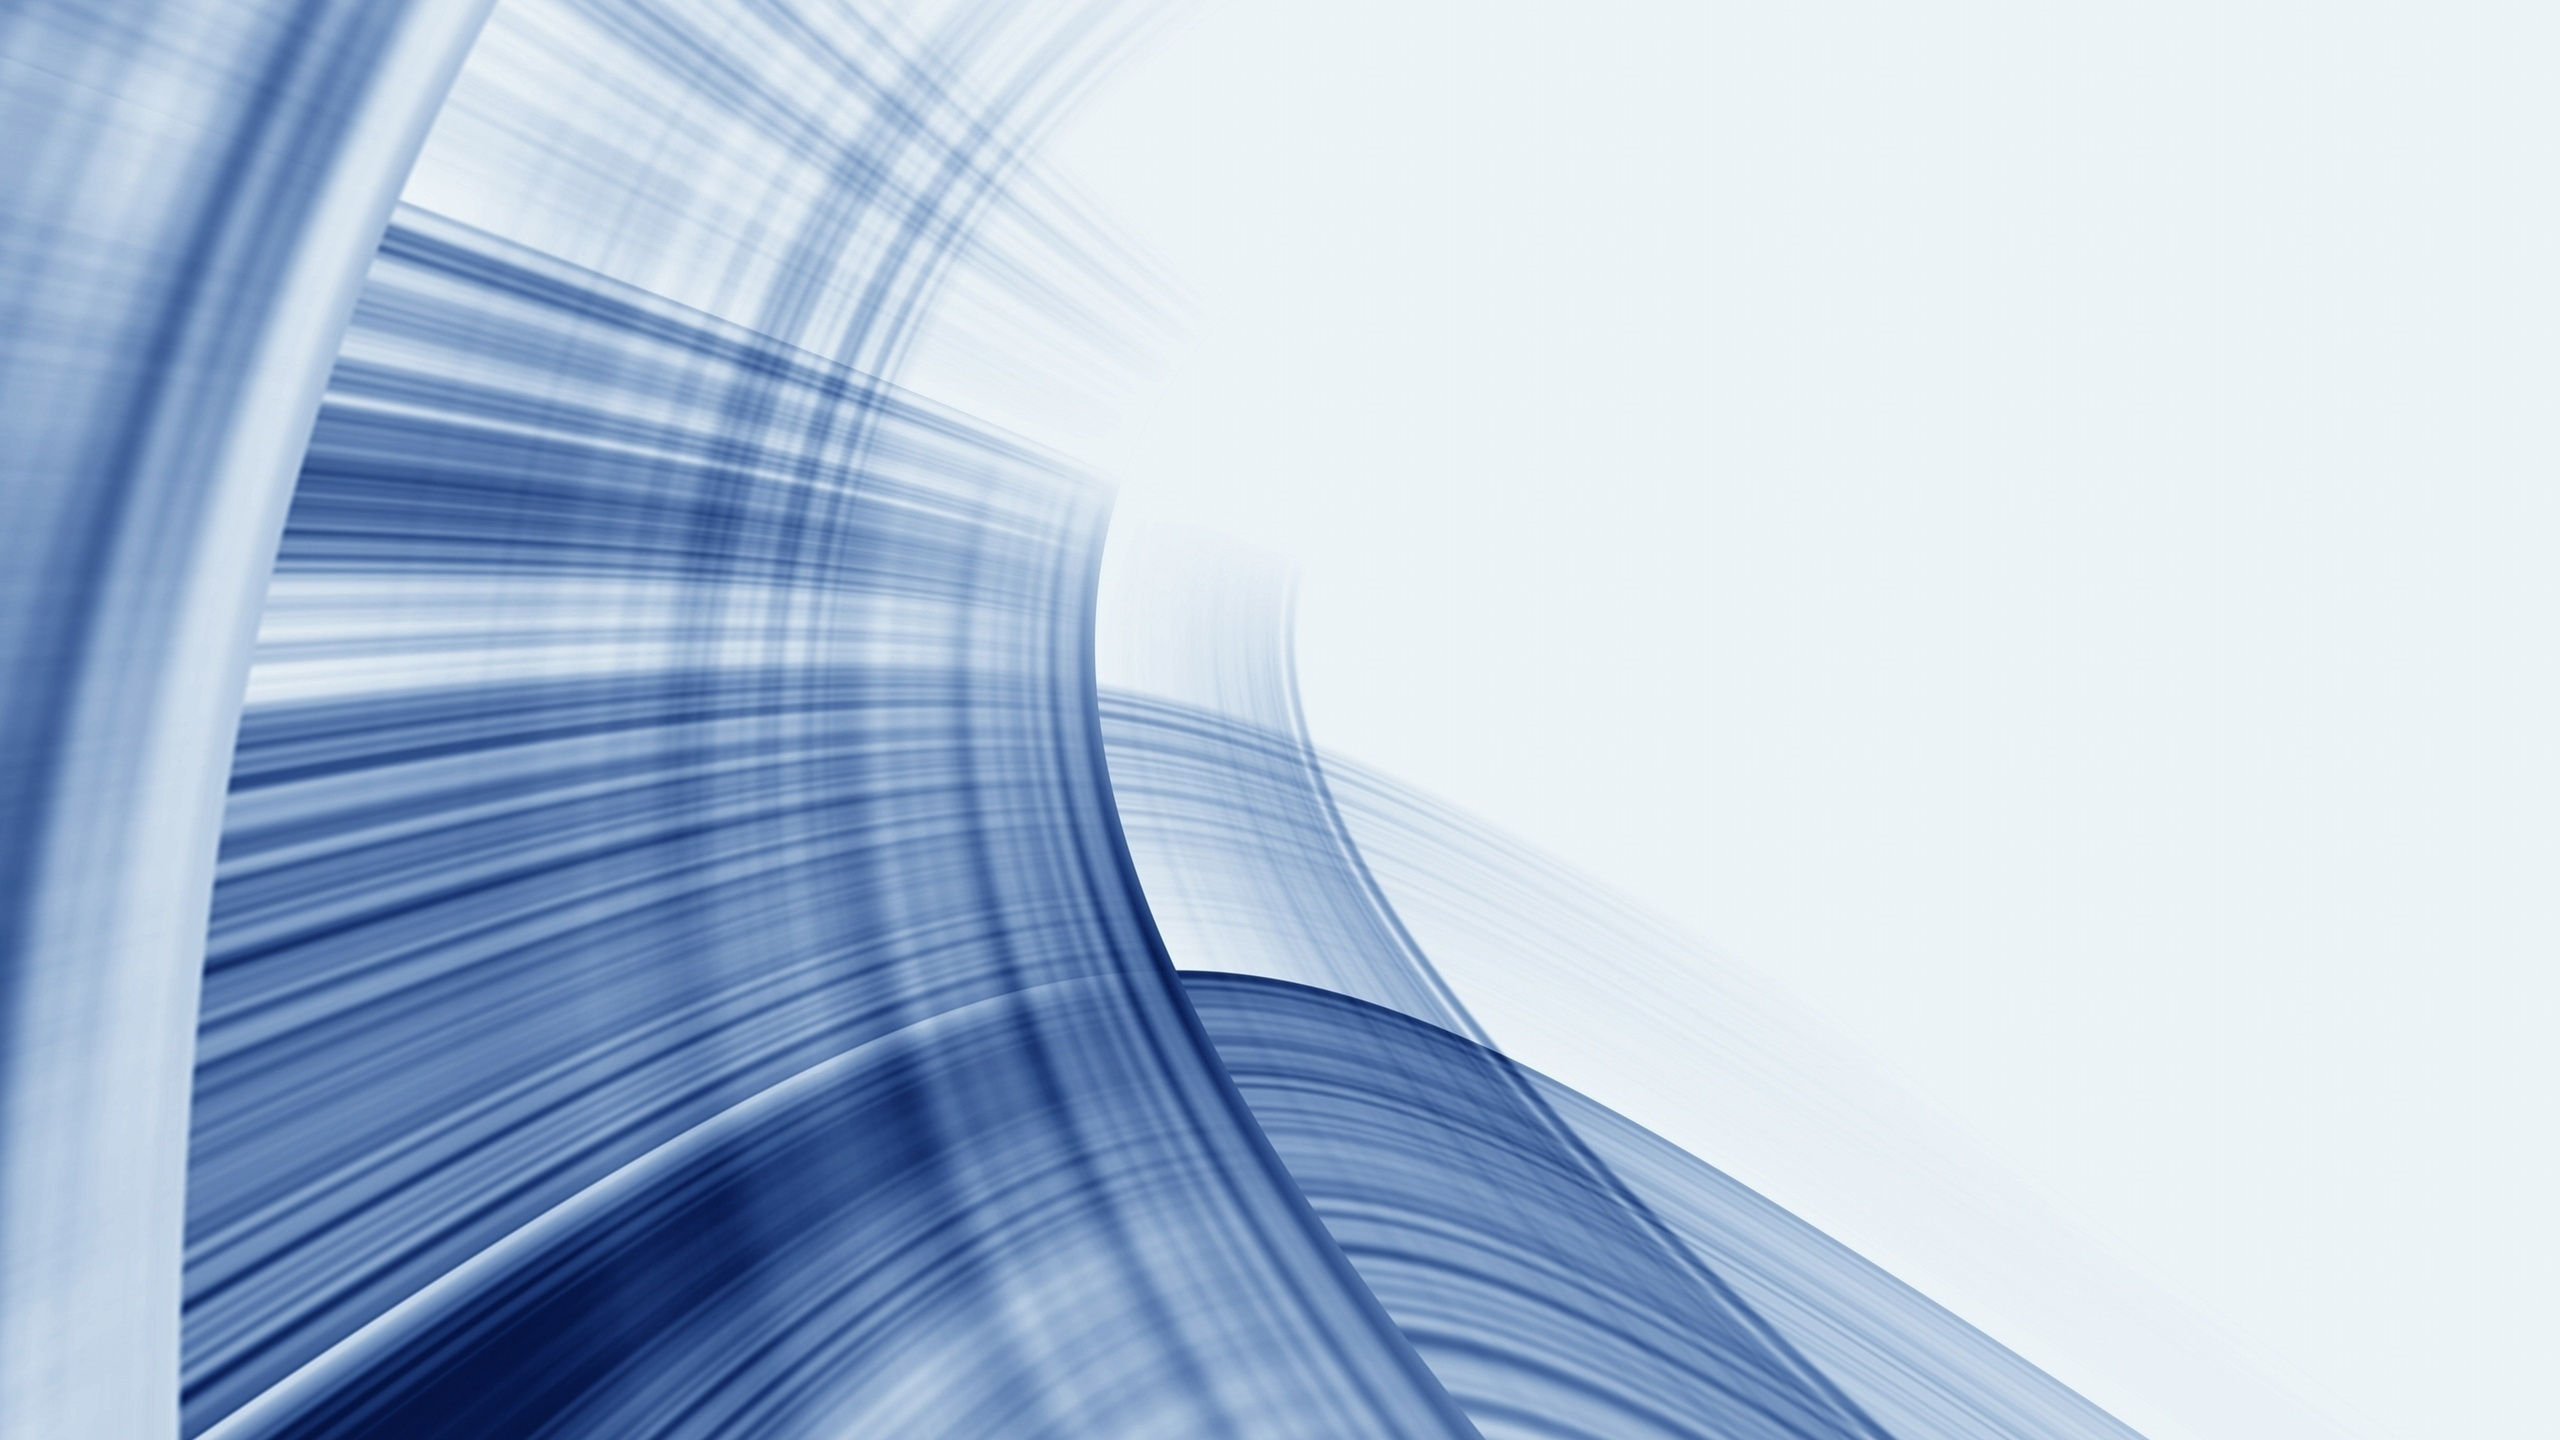 download 2560x1440 blue white - photo #22